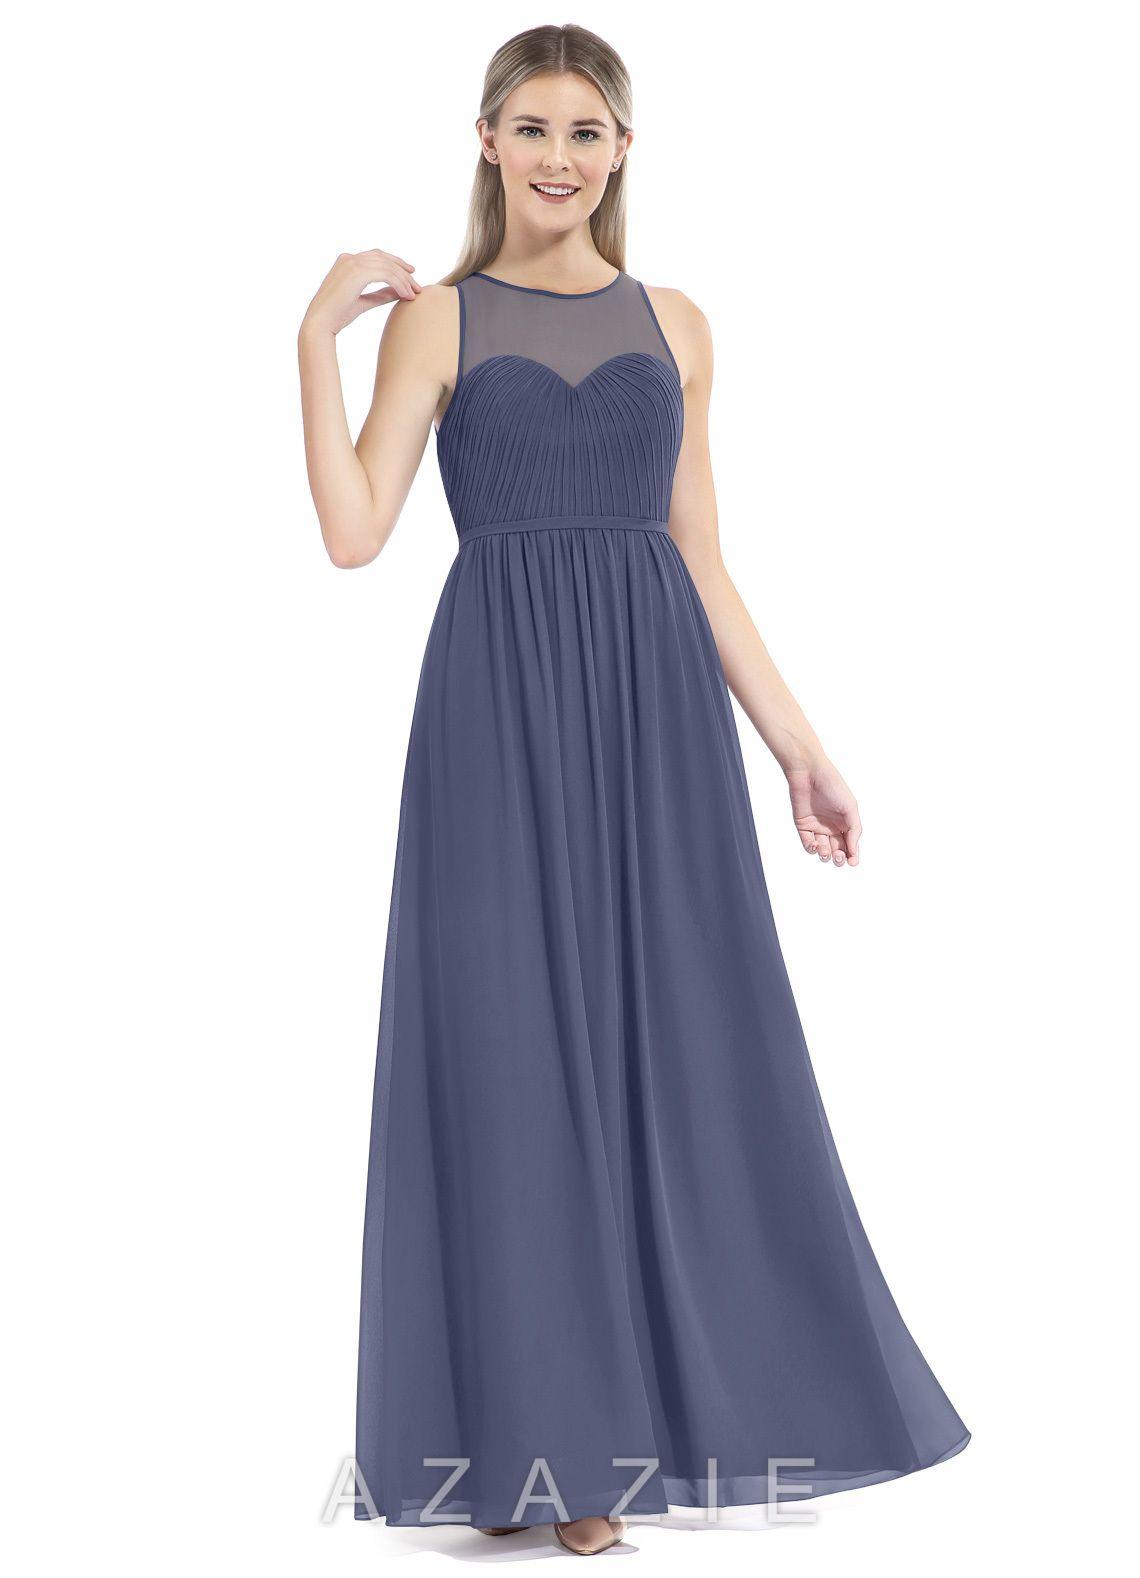 Azazie Maple Bridesmaid Dresses Azazie Stunning Bridesmaid Dresses Azazie Bridesmaid Dresses Stormy Bridesmaid Dresses [ 1578 x 1140 Pixel ]